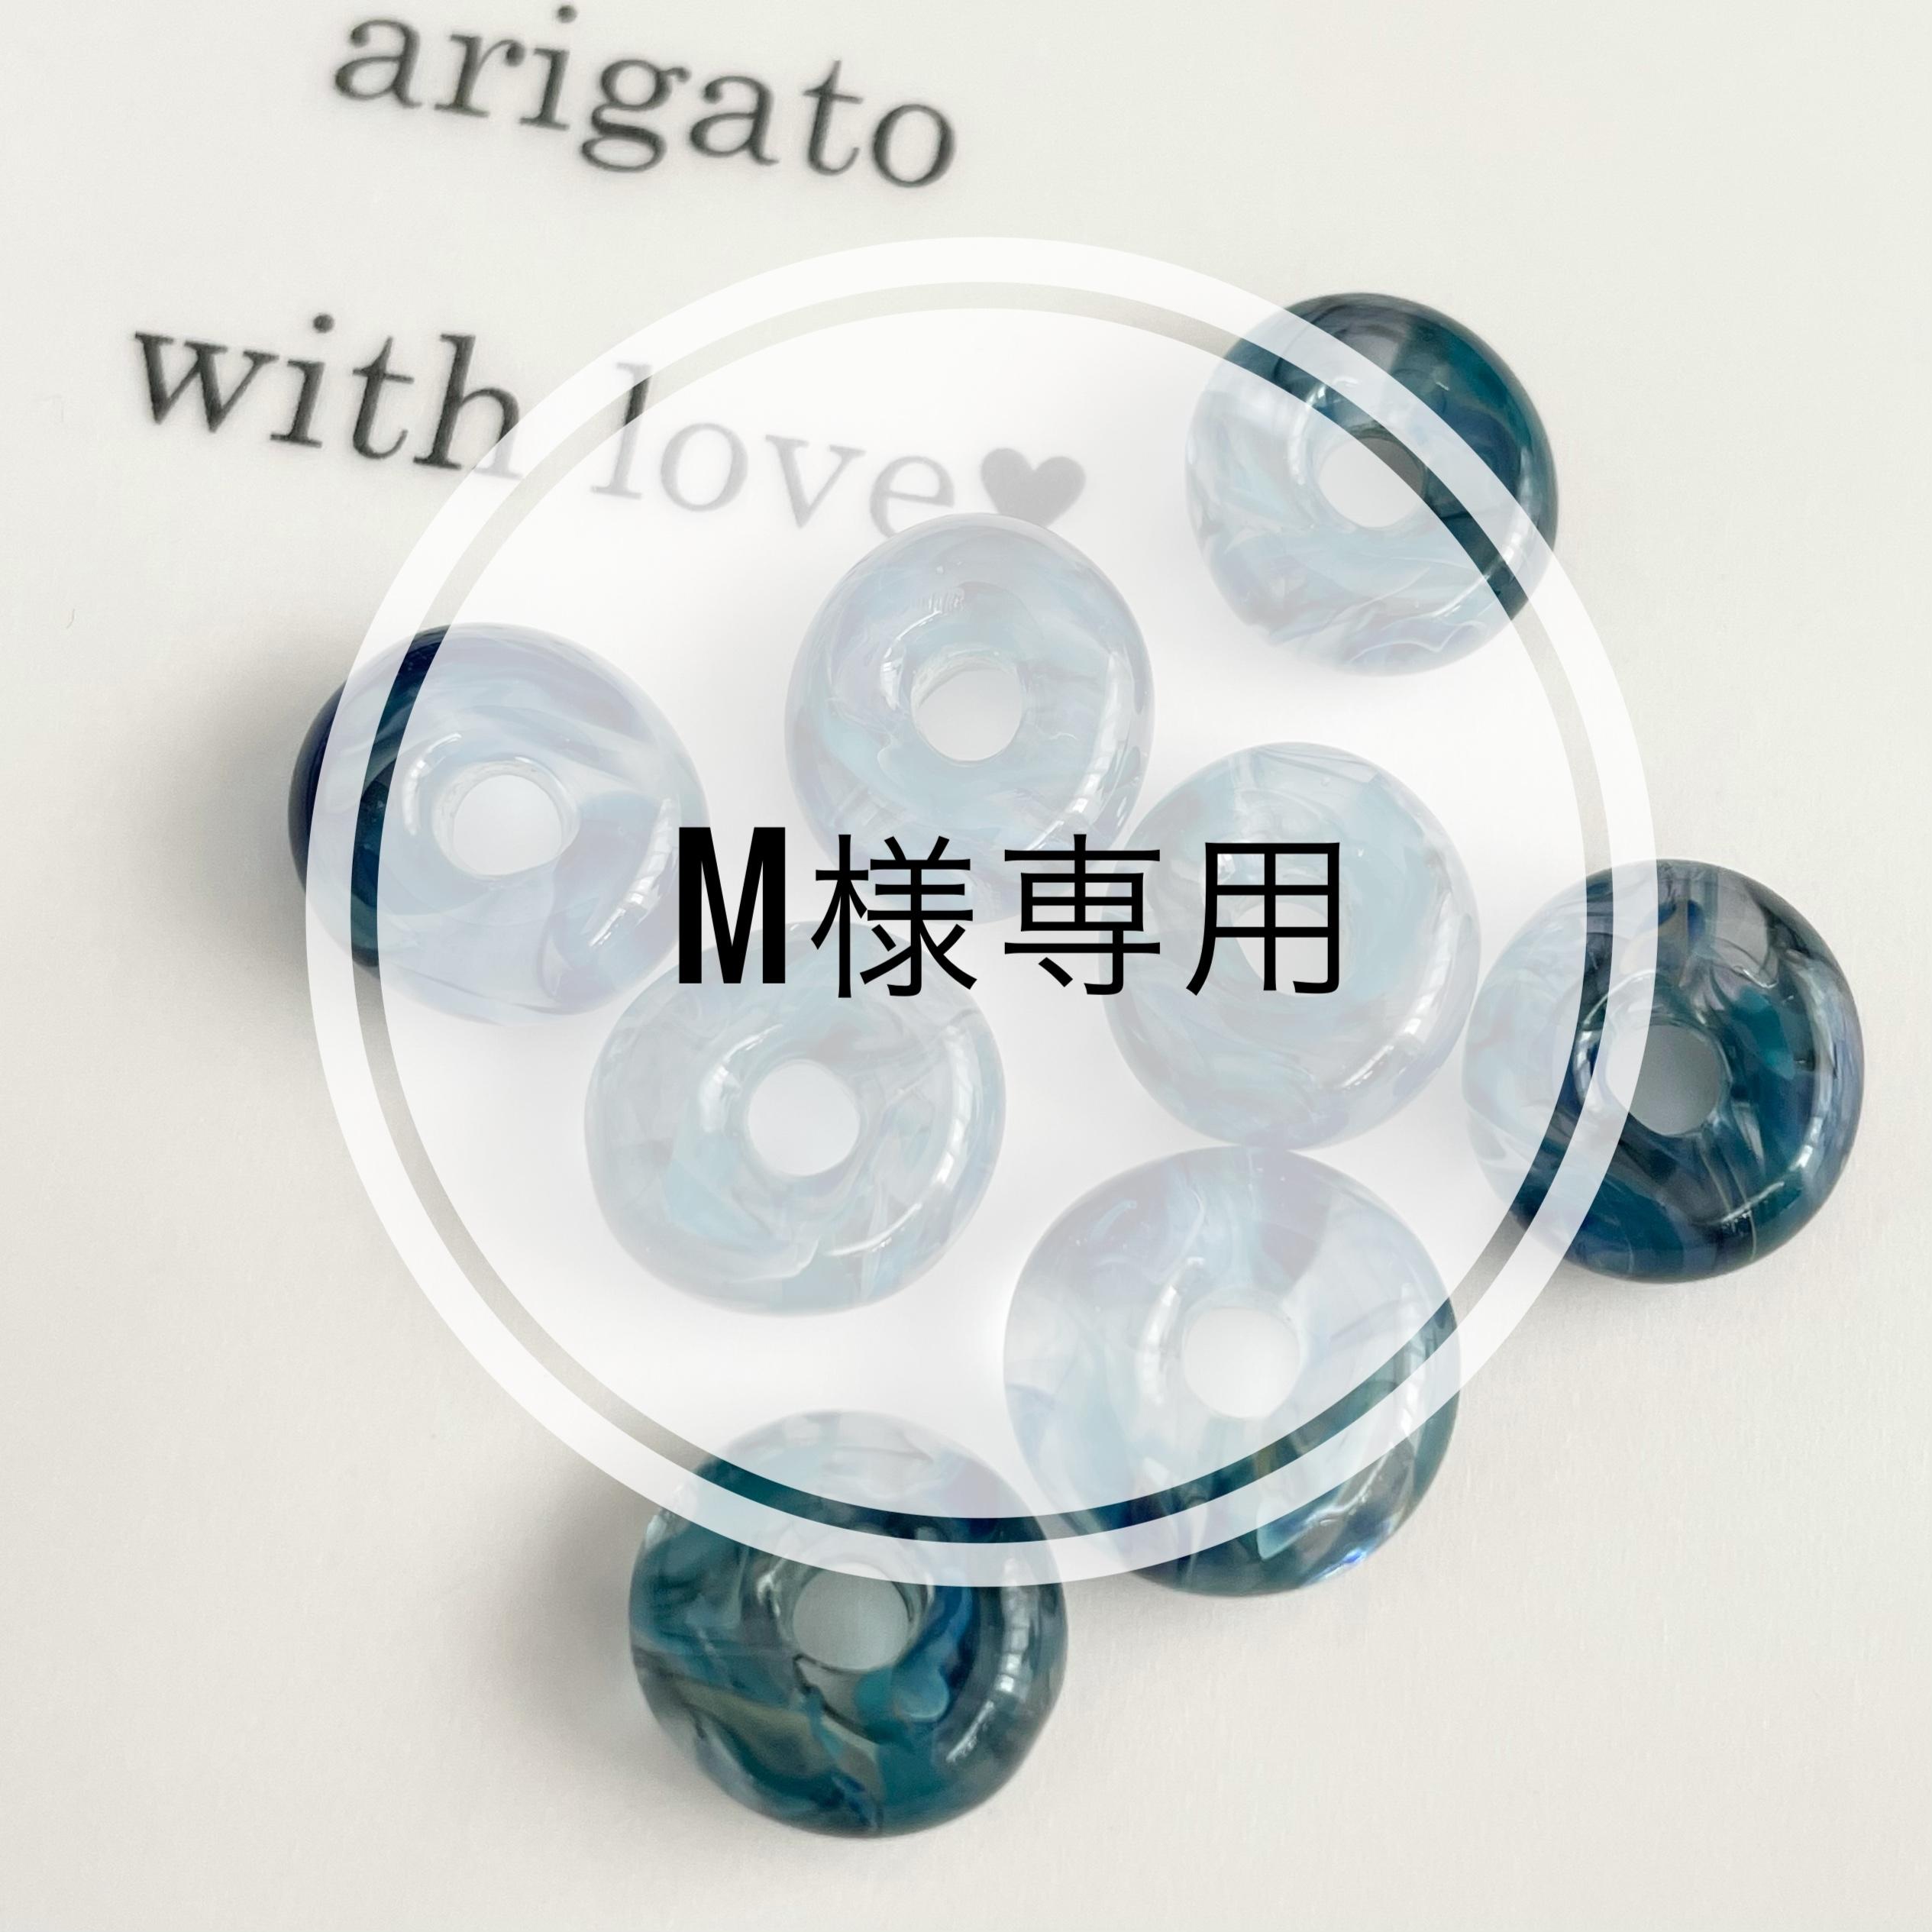 【 M様専用】追加分 パイレックスガラス製マーブル模様のドーナツ型リング(クリア+青系) 【ポスト投函可能】